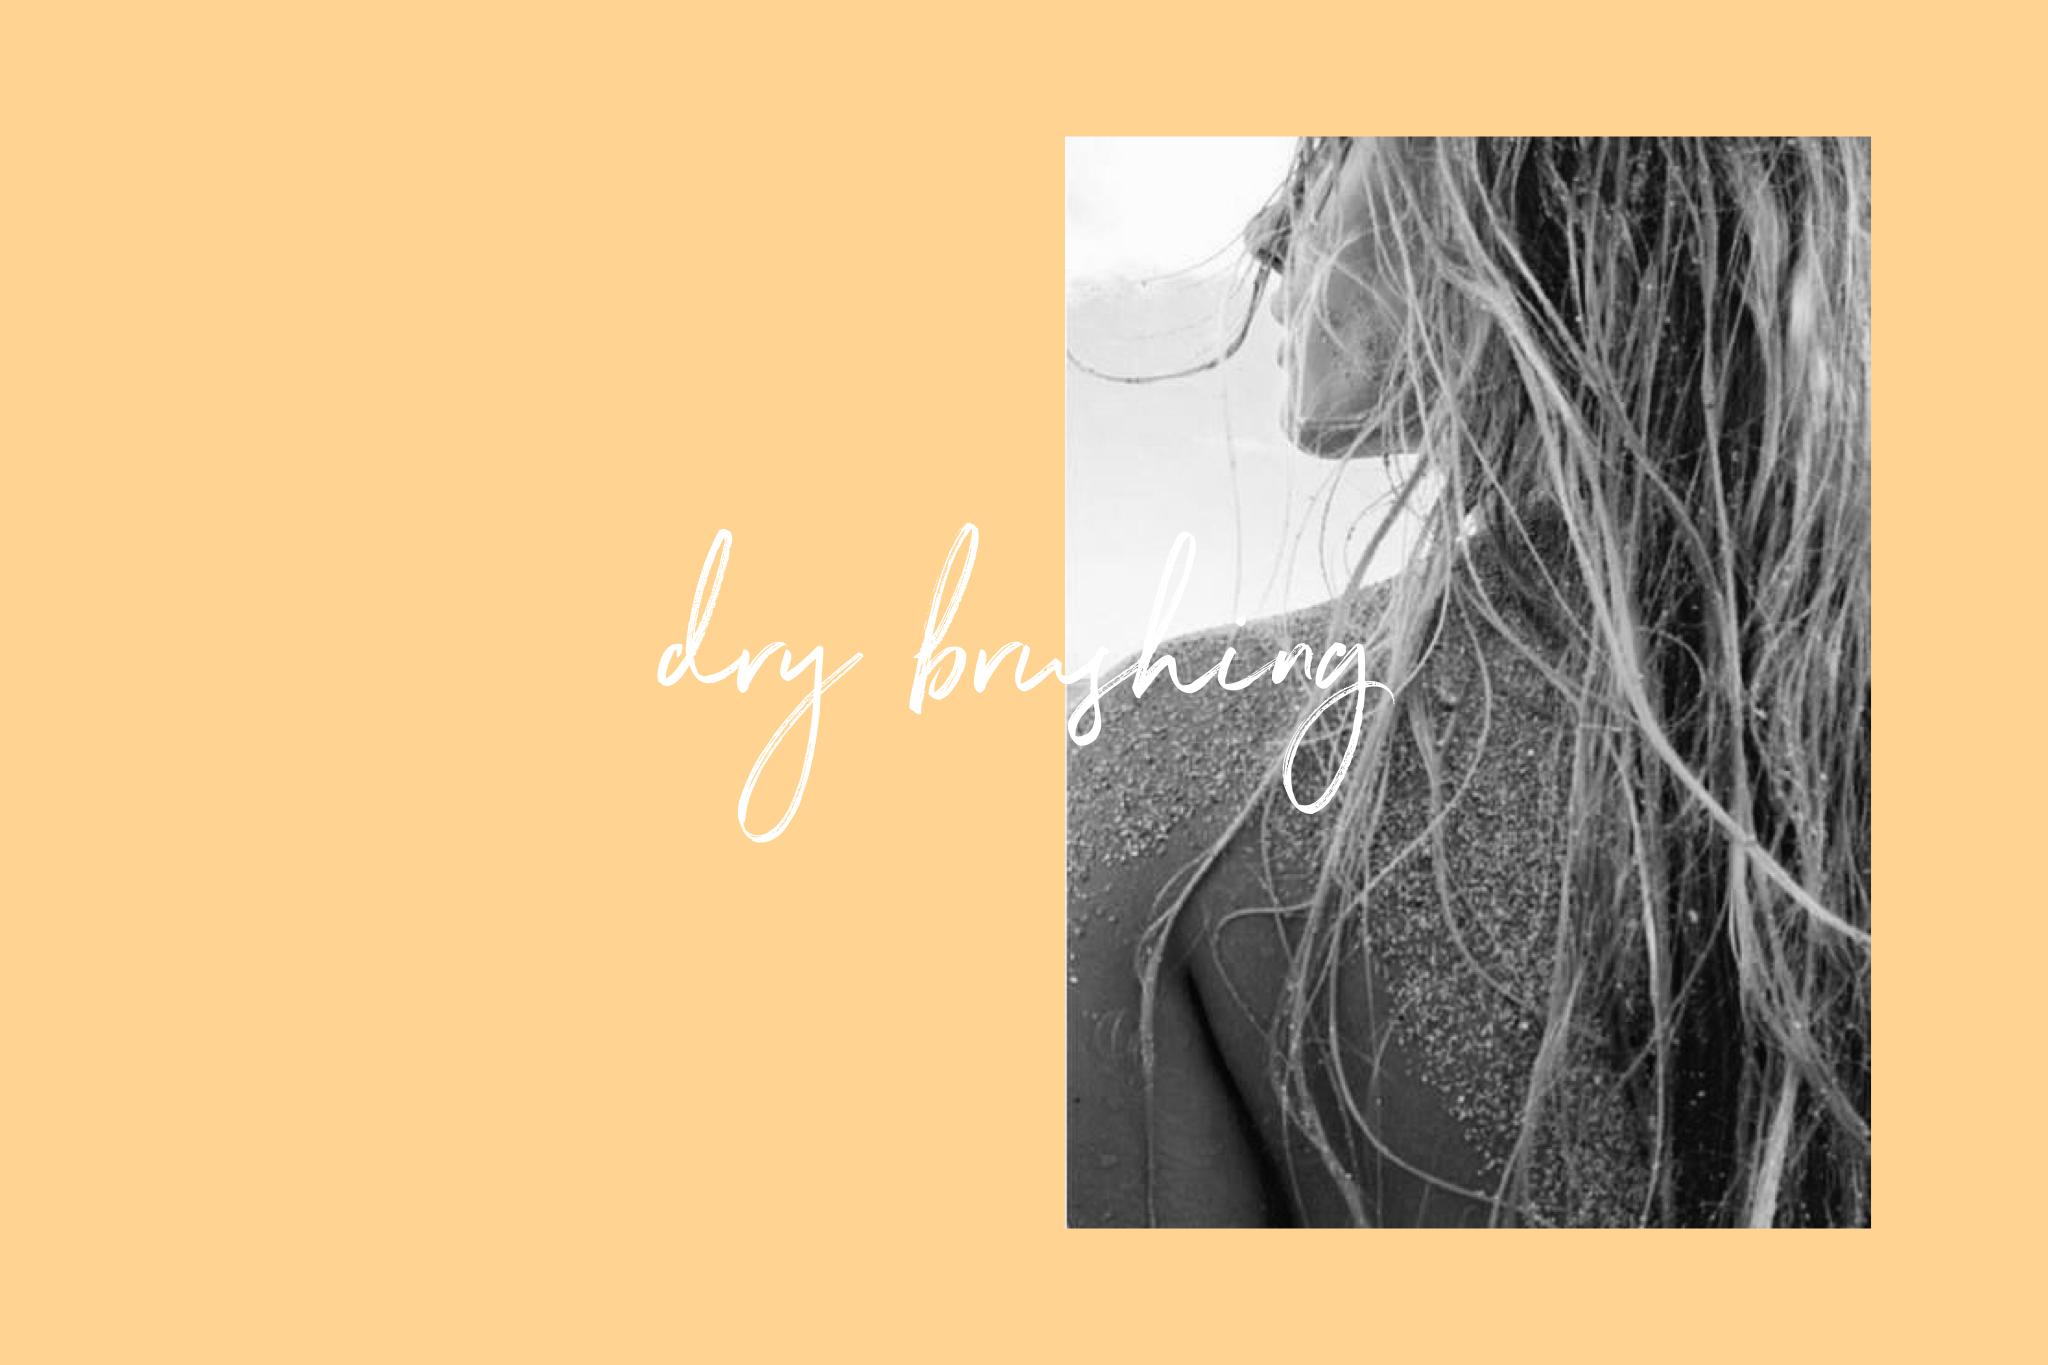 wellness_trends_dry_brushing_cryo_therapy_infrared_sauna_goop